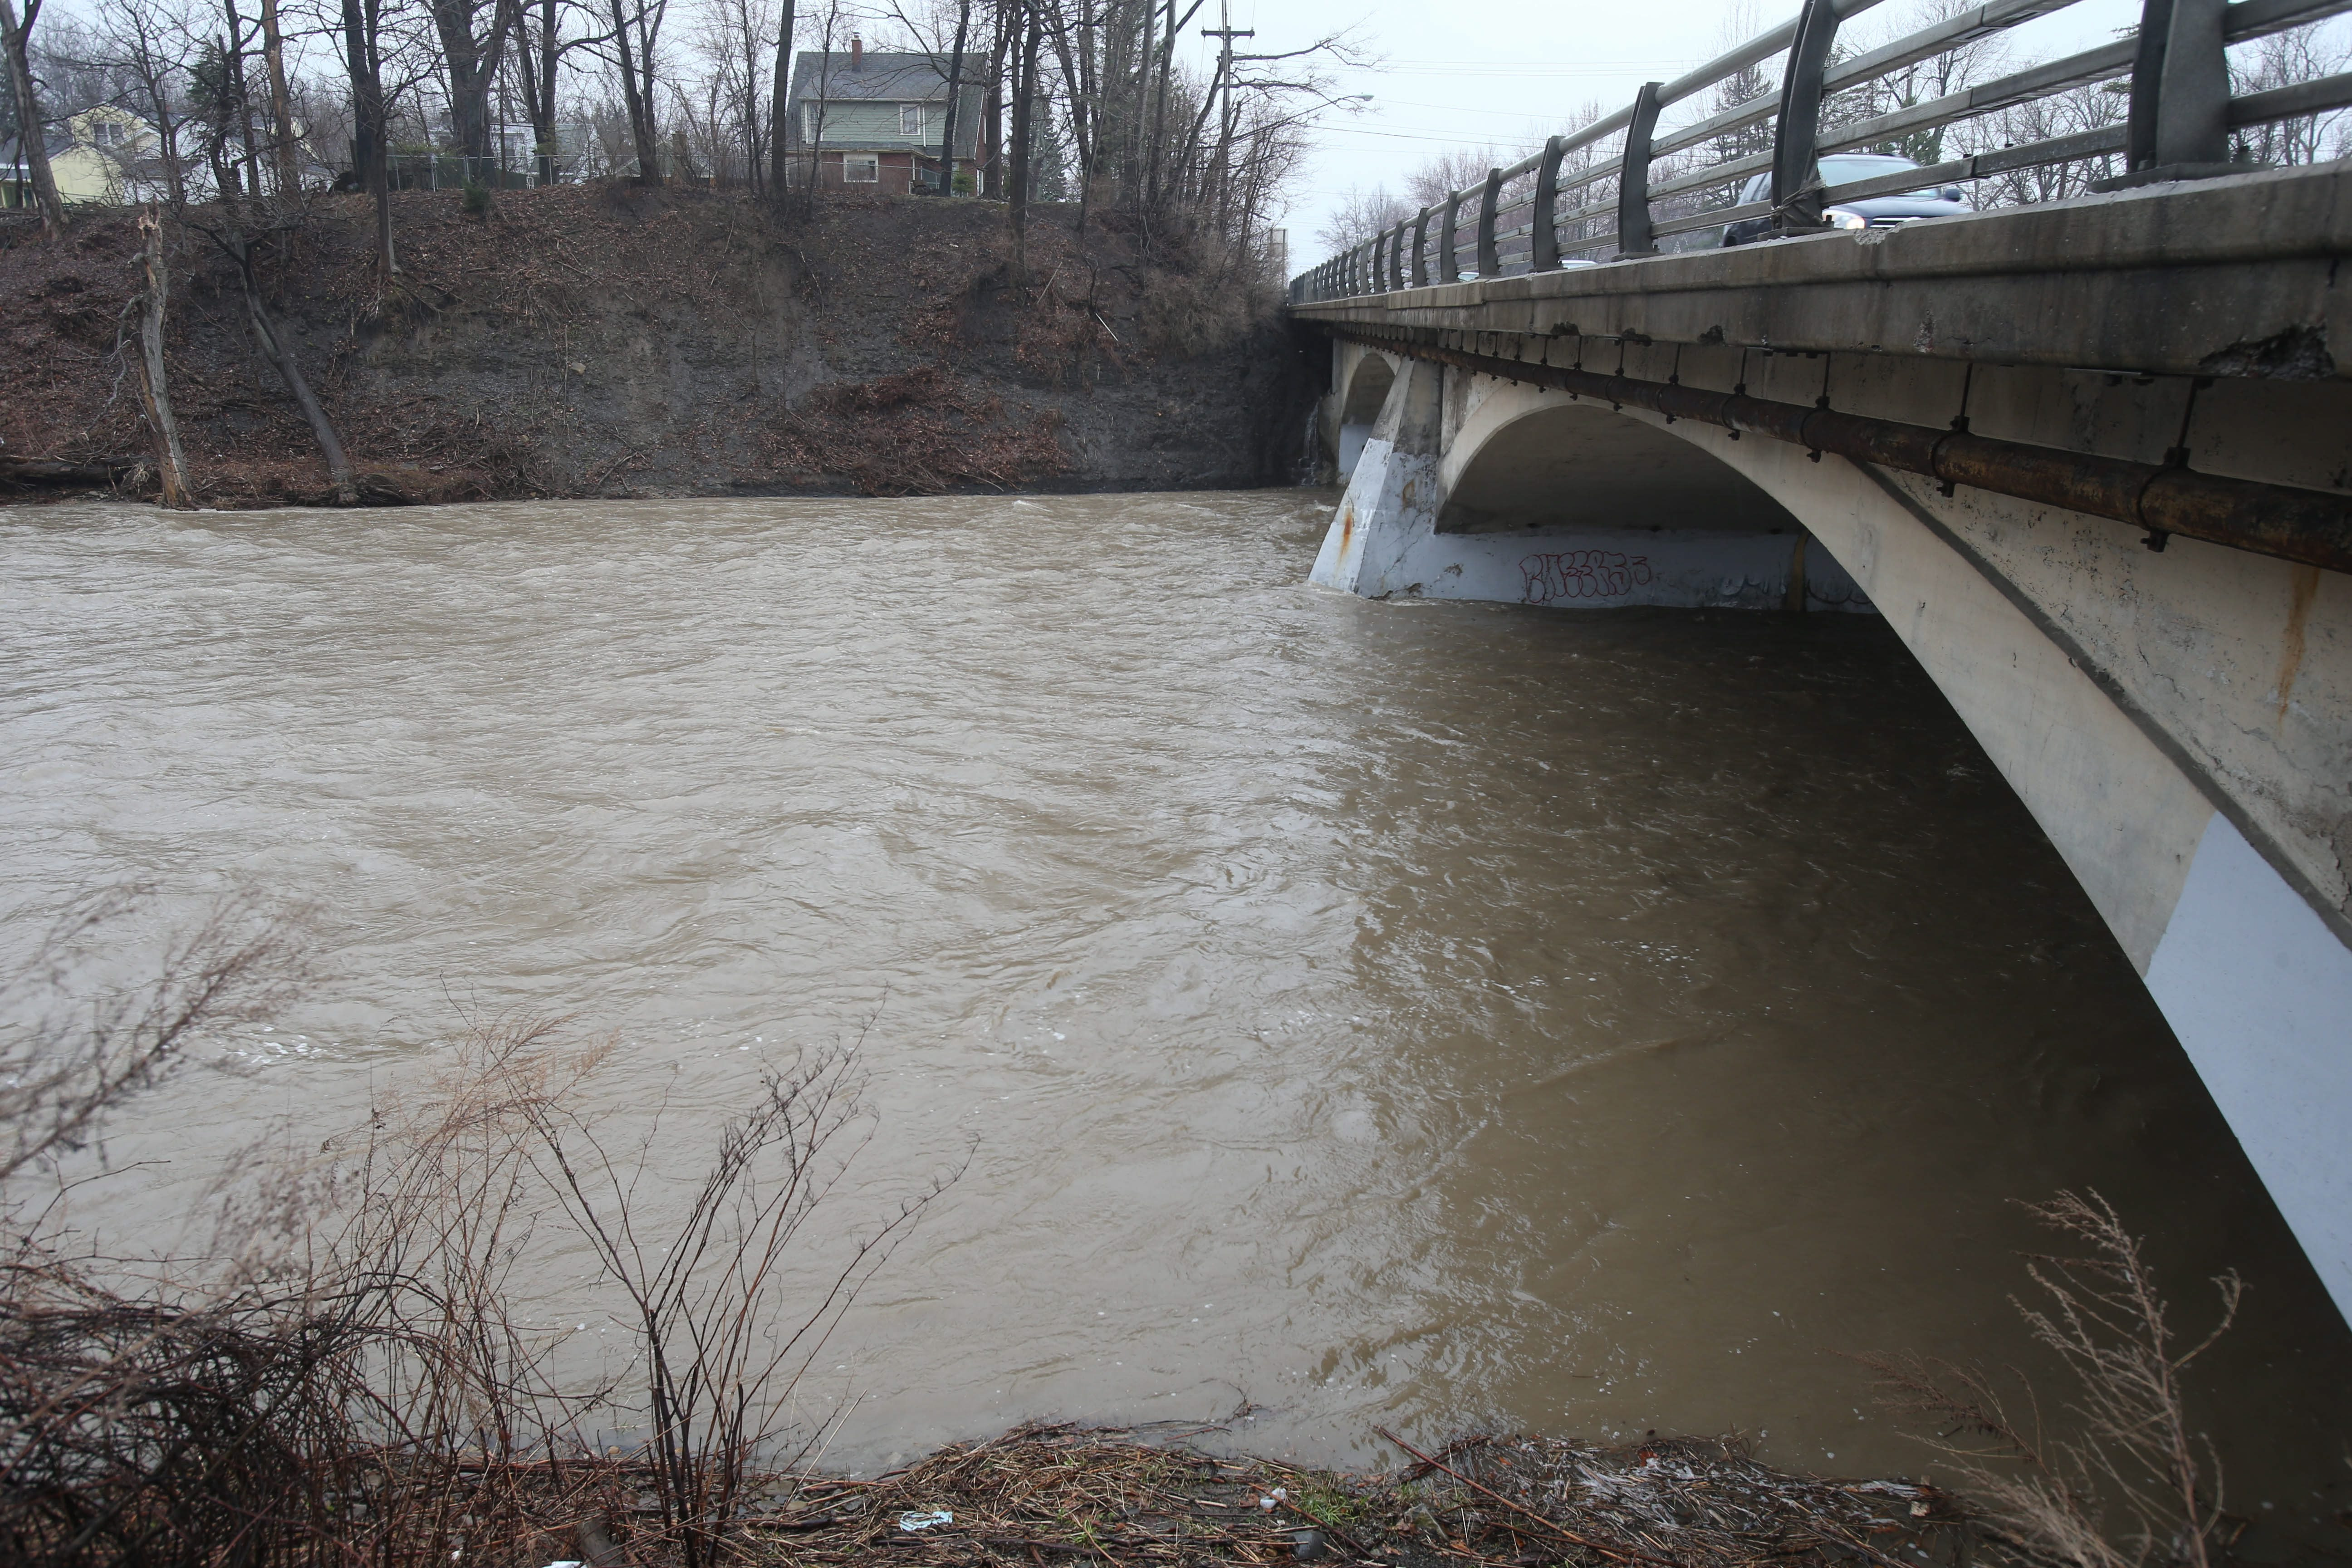 Cazenovia Creek rushes below a bridge on Union Road in West Seneca. (Robert Kirkham/News file photo)